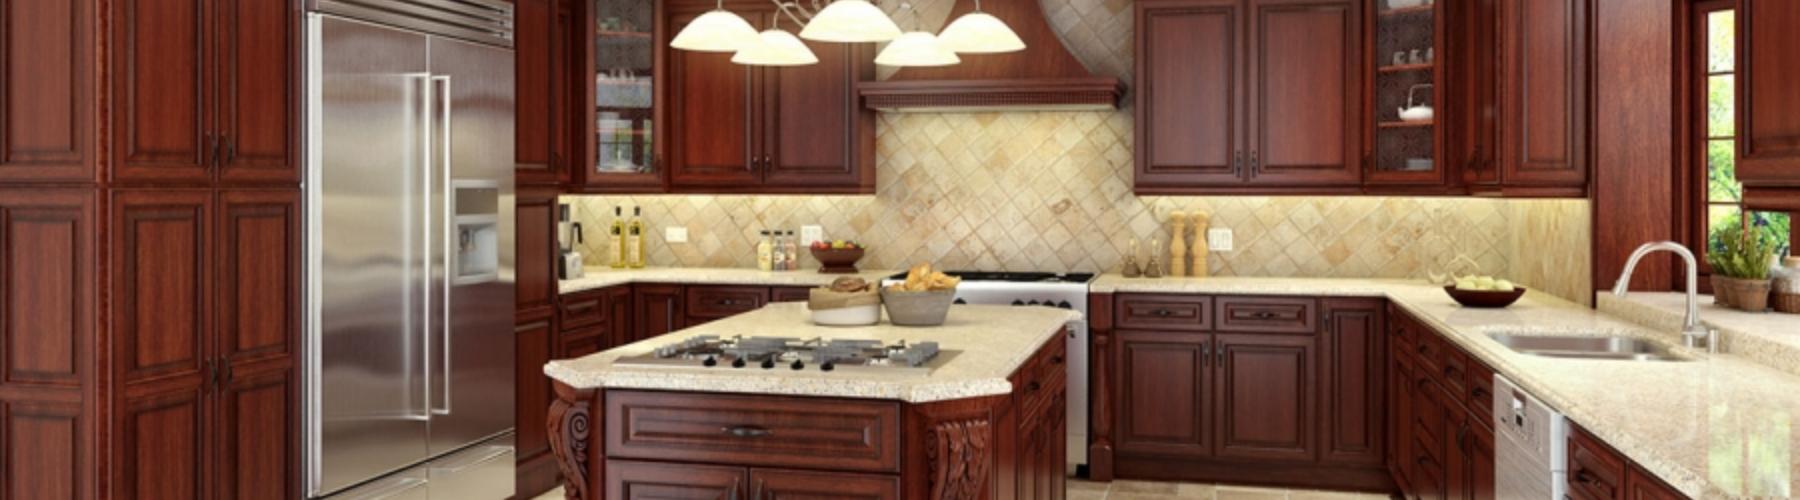 Kitchen Cabinet Showroom Ossining NY cover image